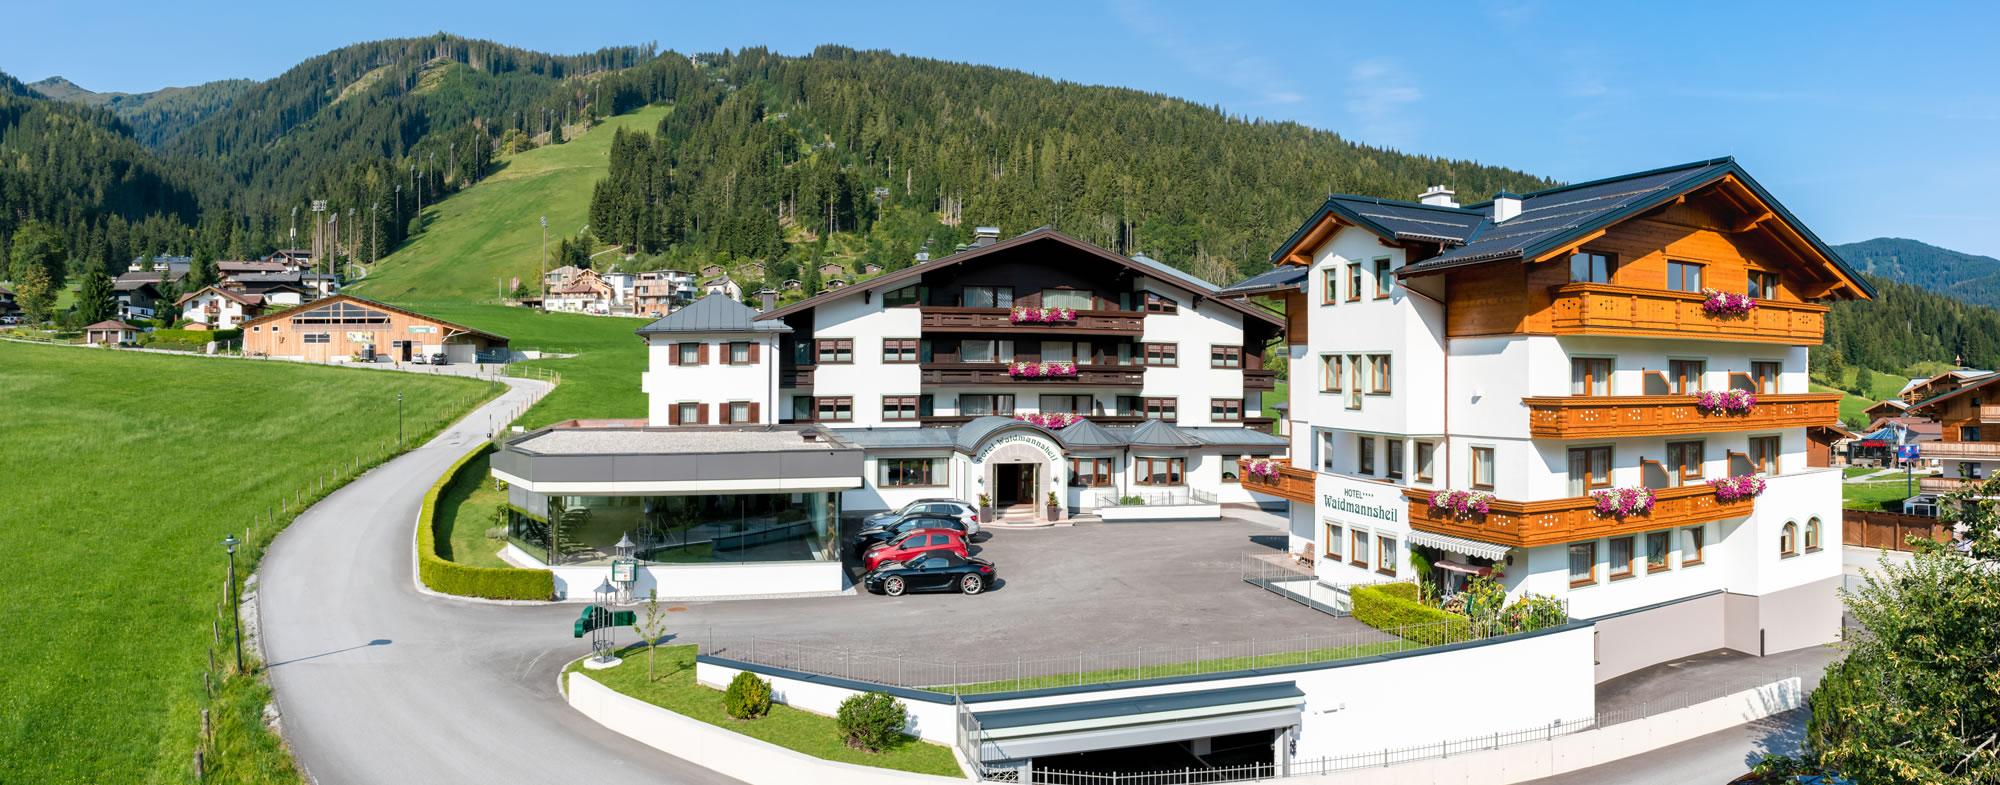 Hotel Waidmannsheil Flachau Telefon 06457 2368